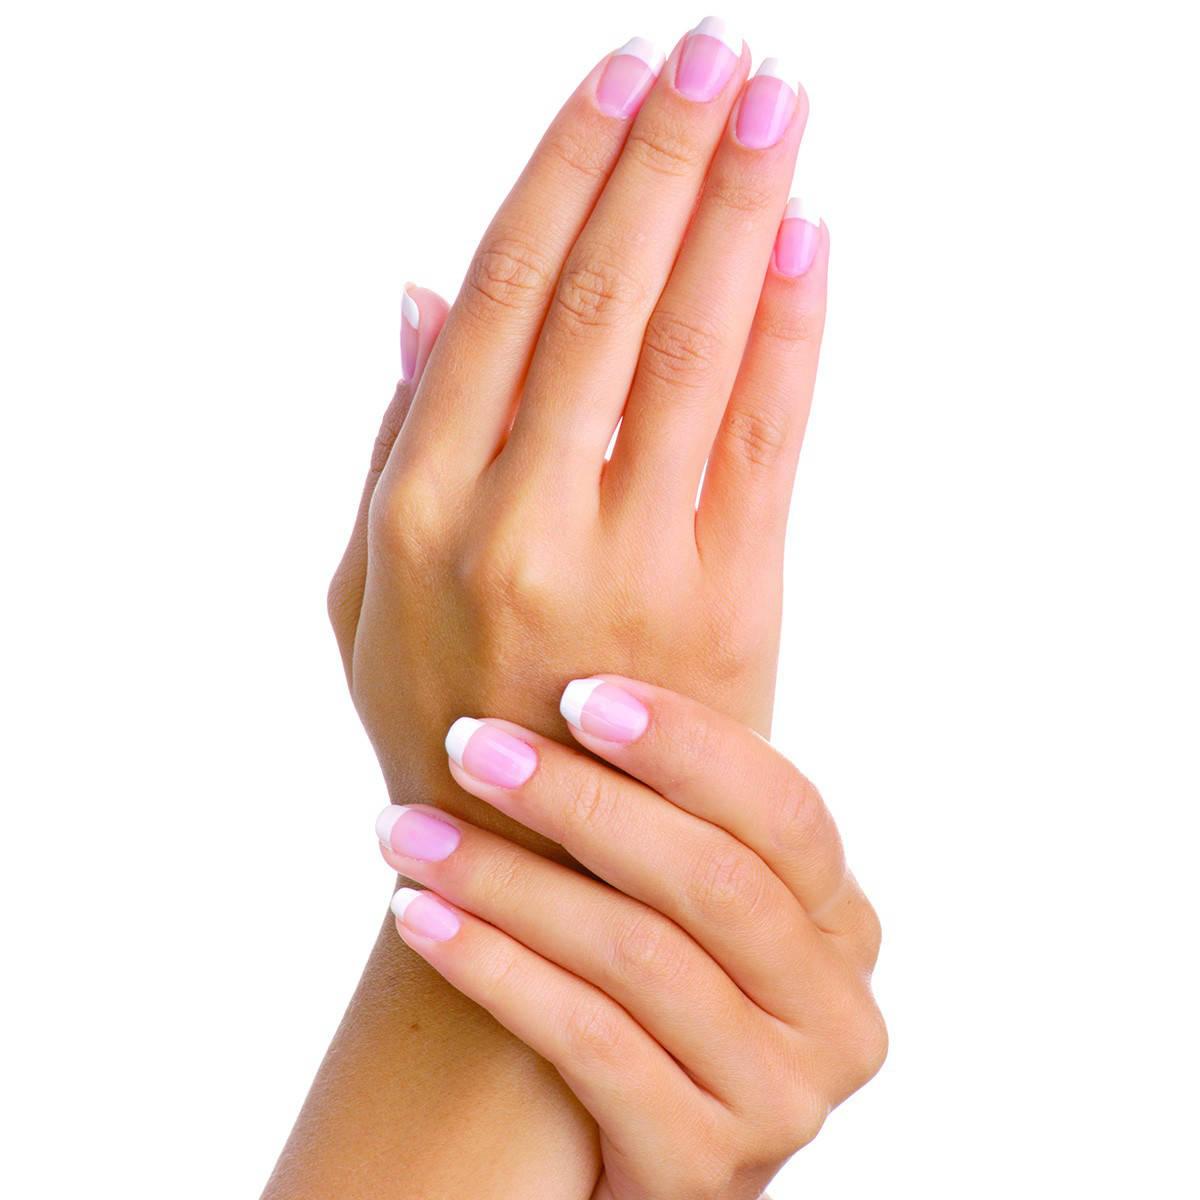 Nail clipart beautiful hand #10